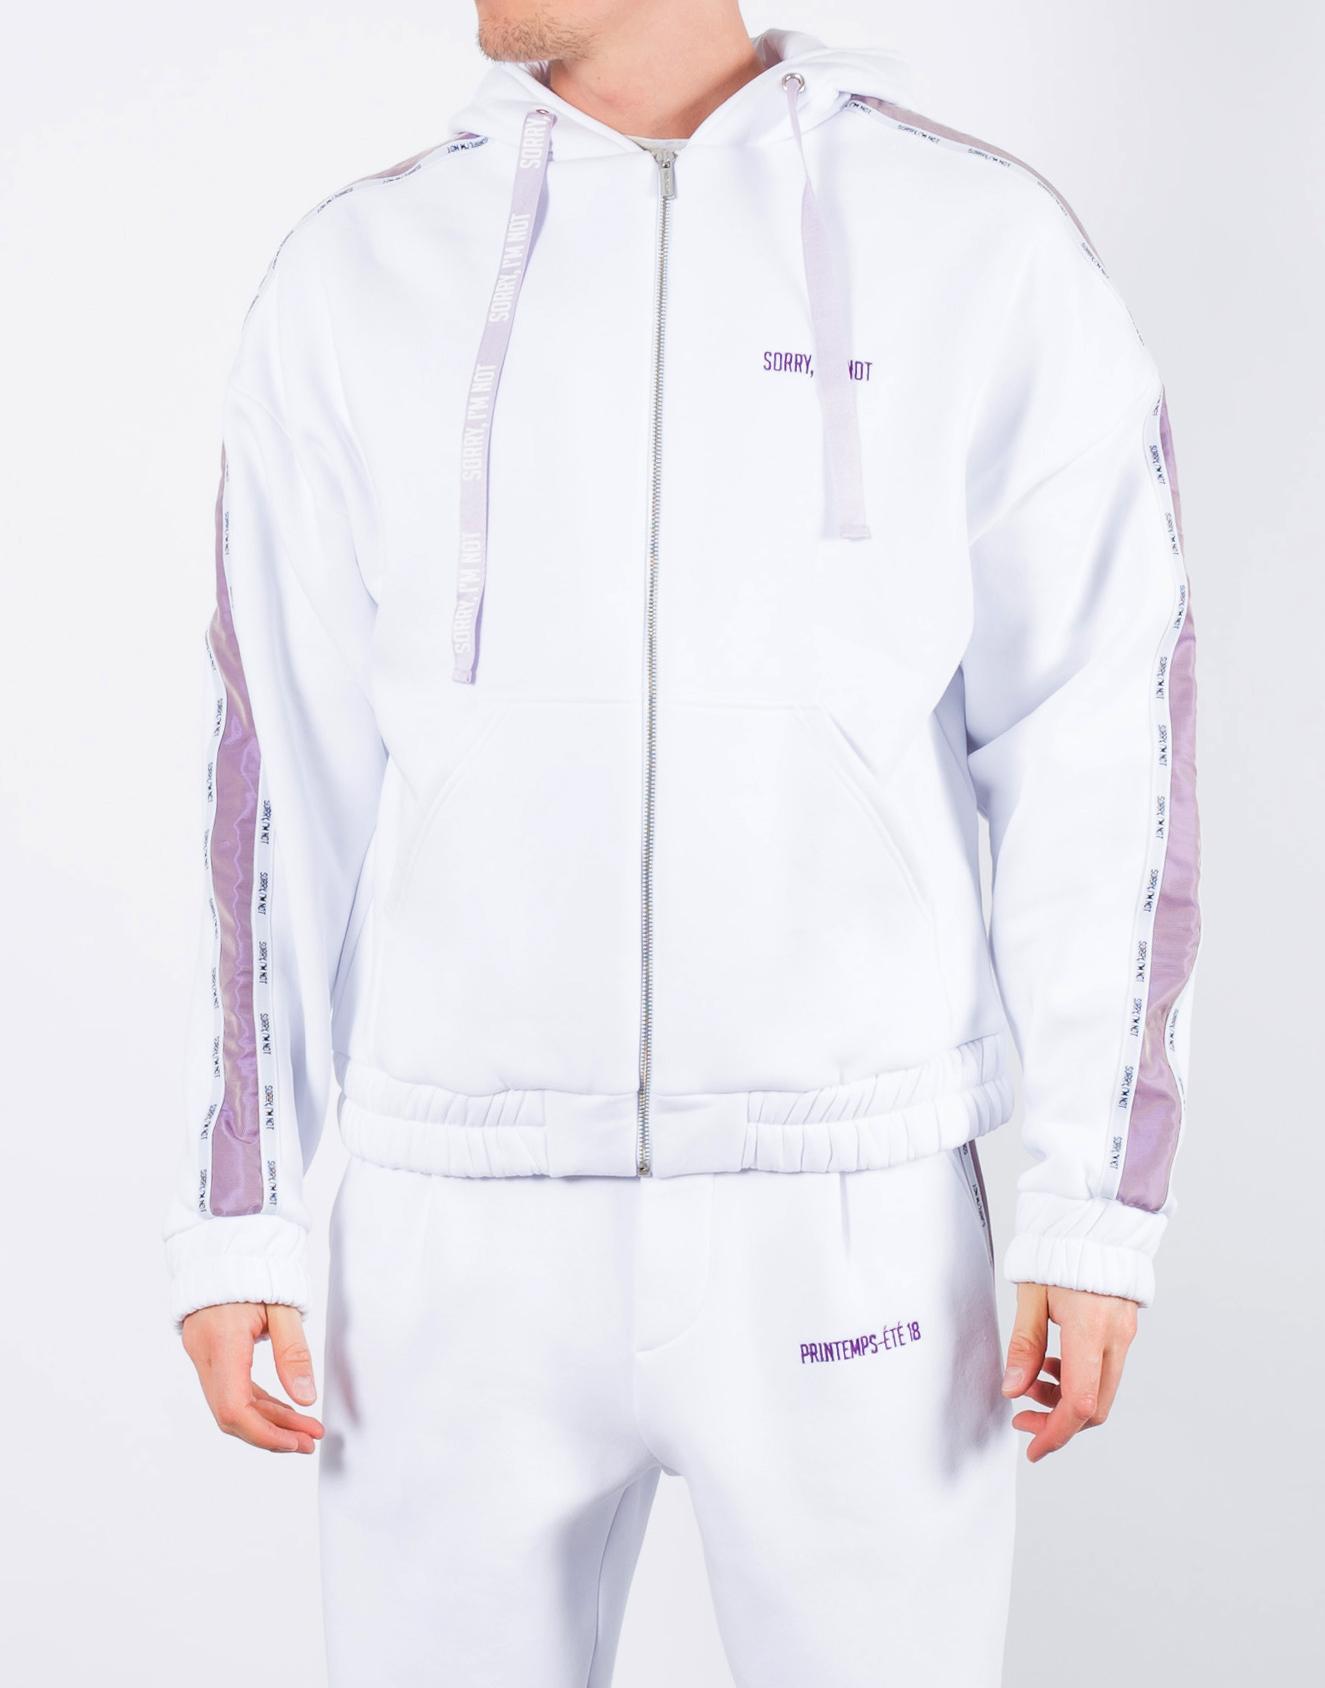 олимп бел м